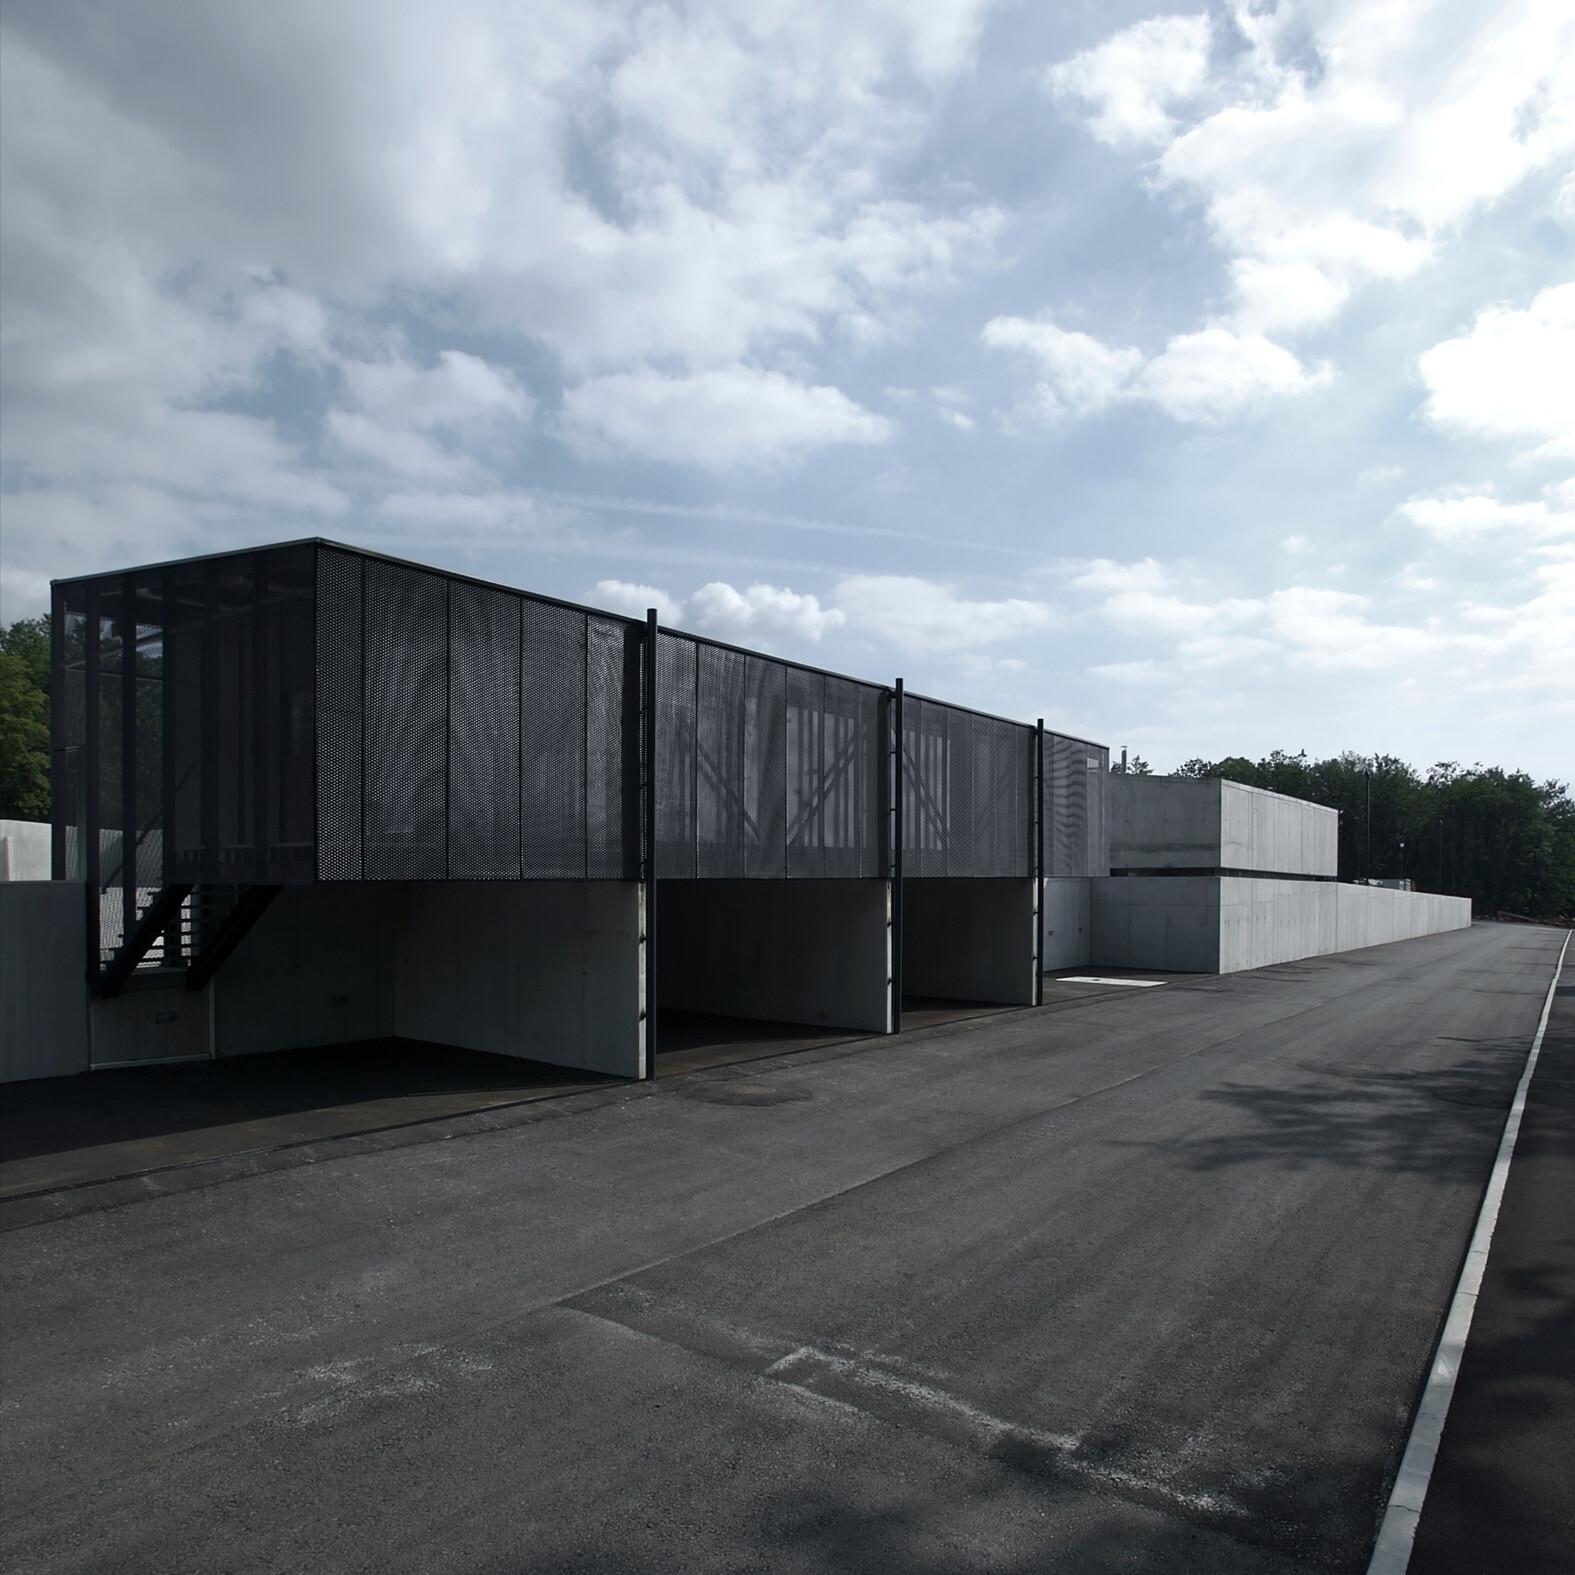 Odpad Pivka - Metal recycling plant